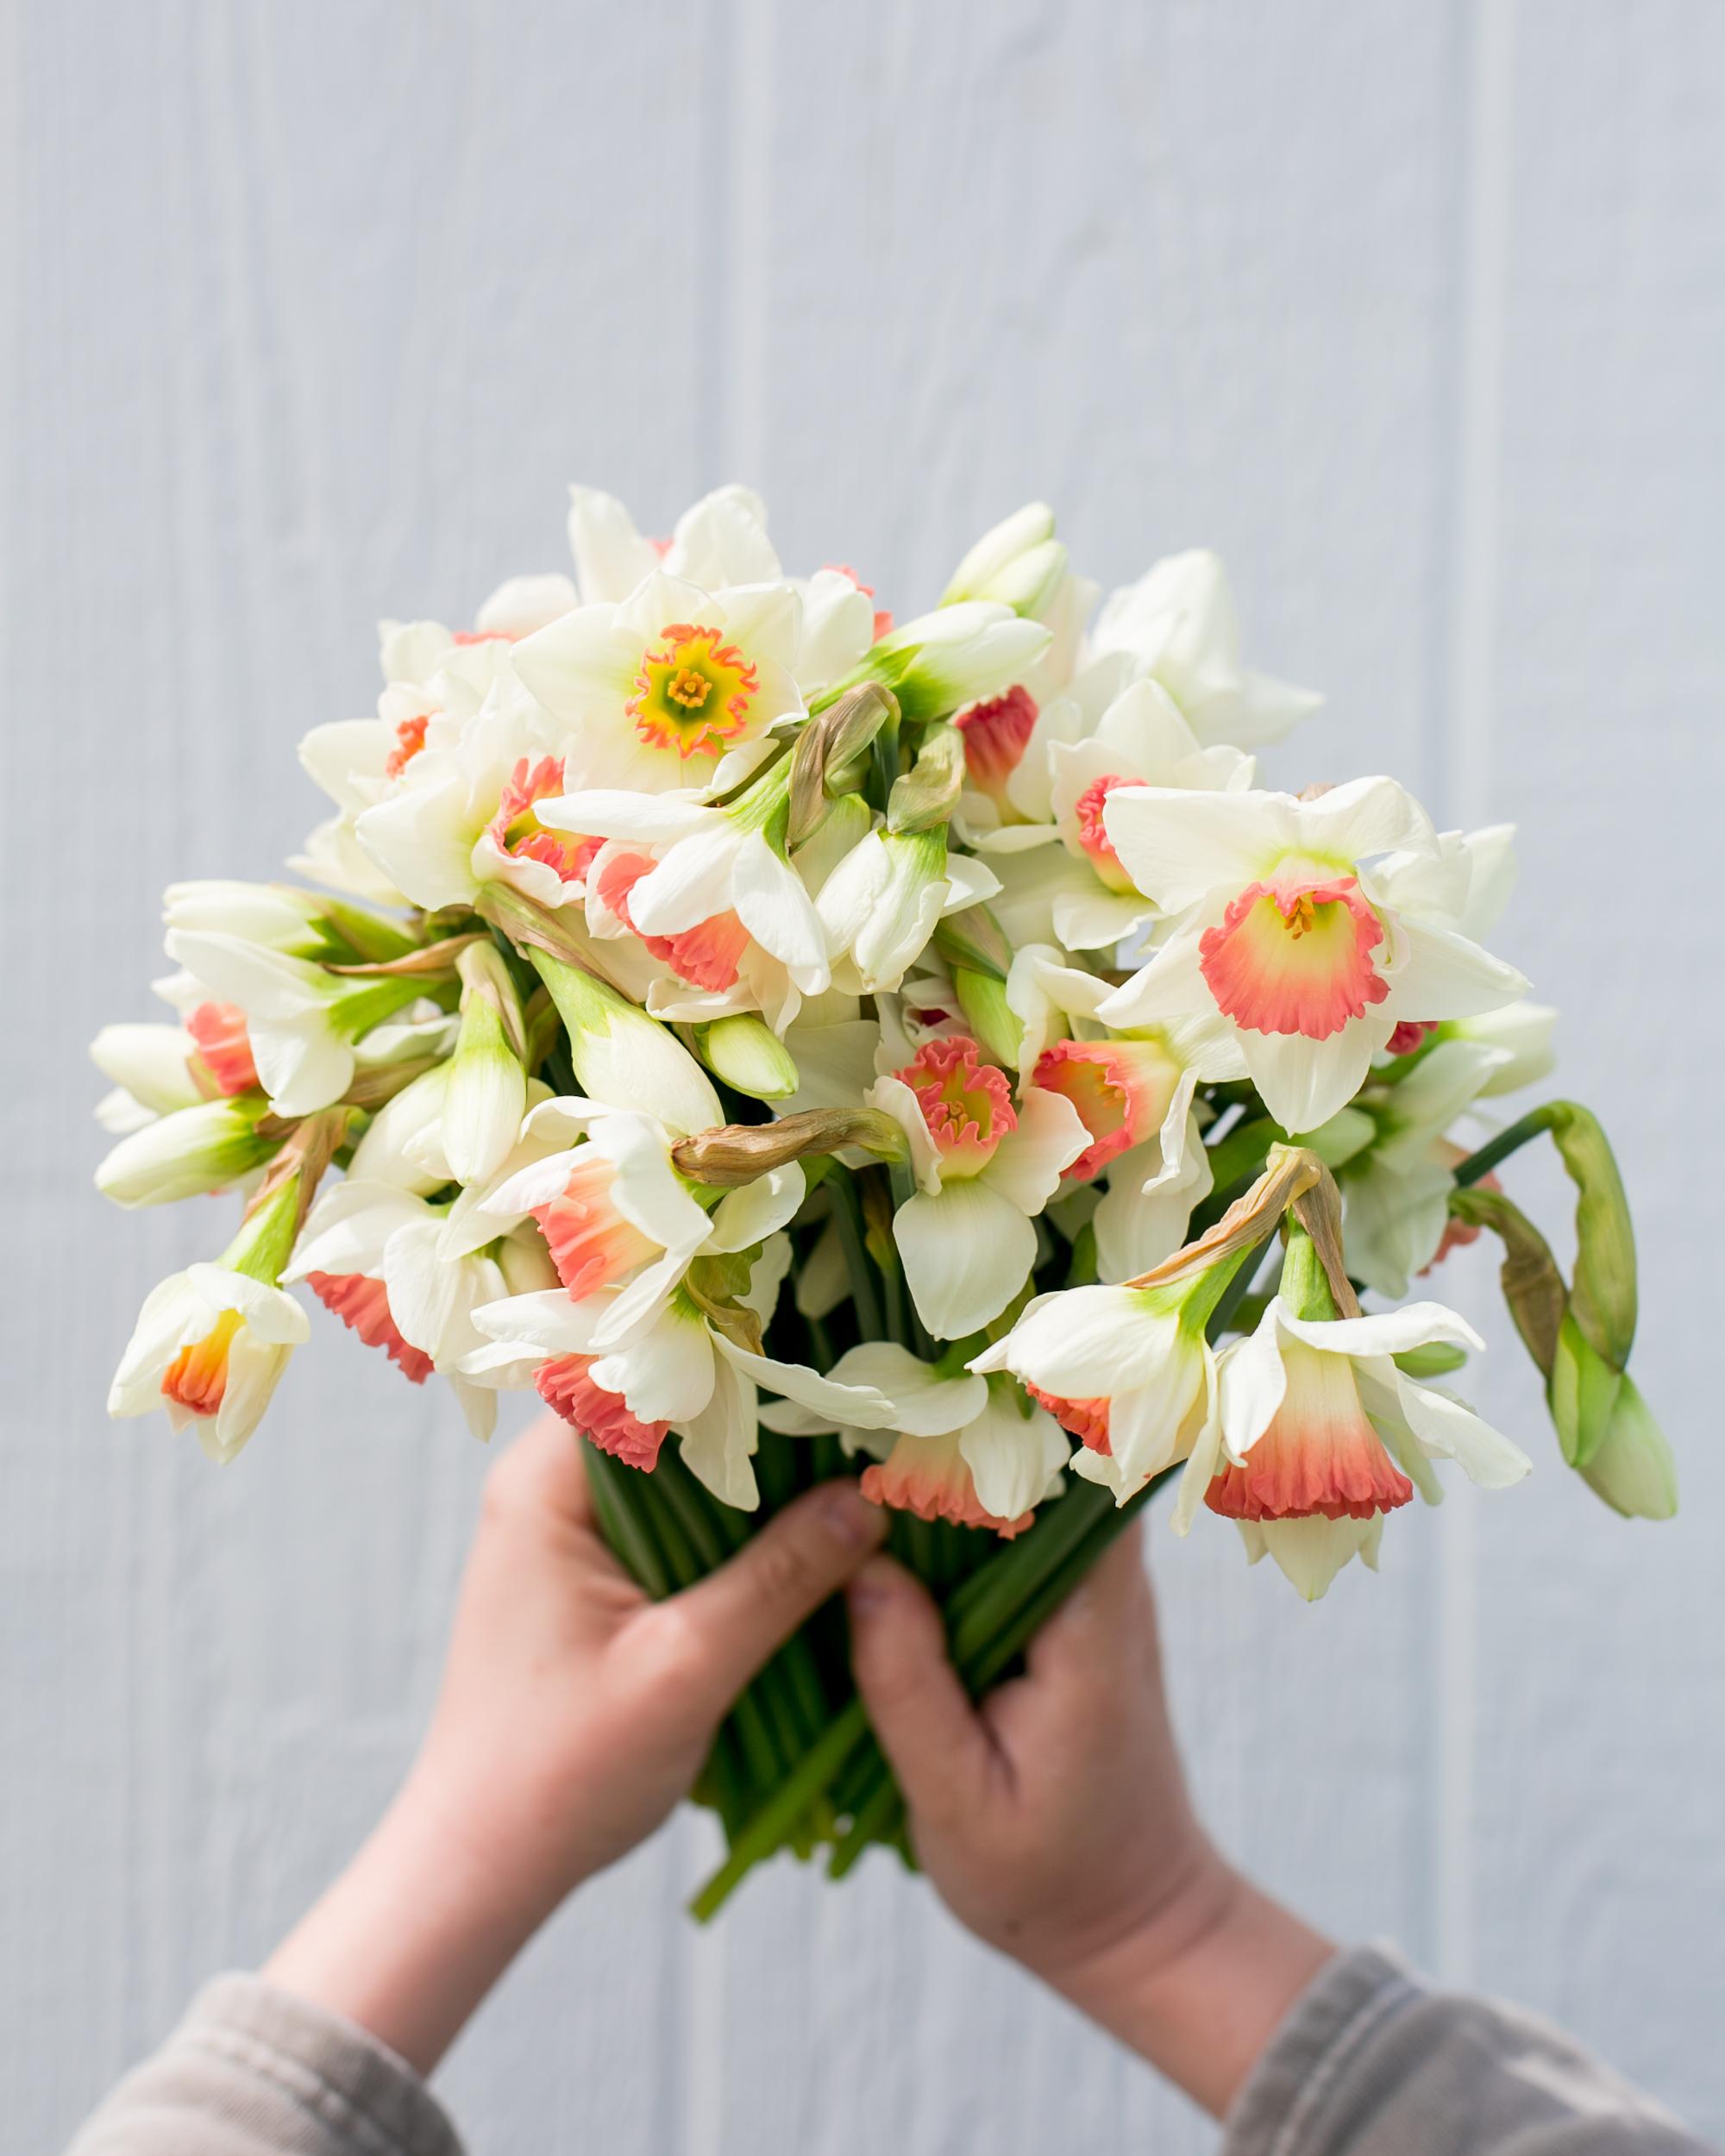 daffodil19-3.jpg